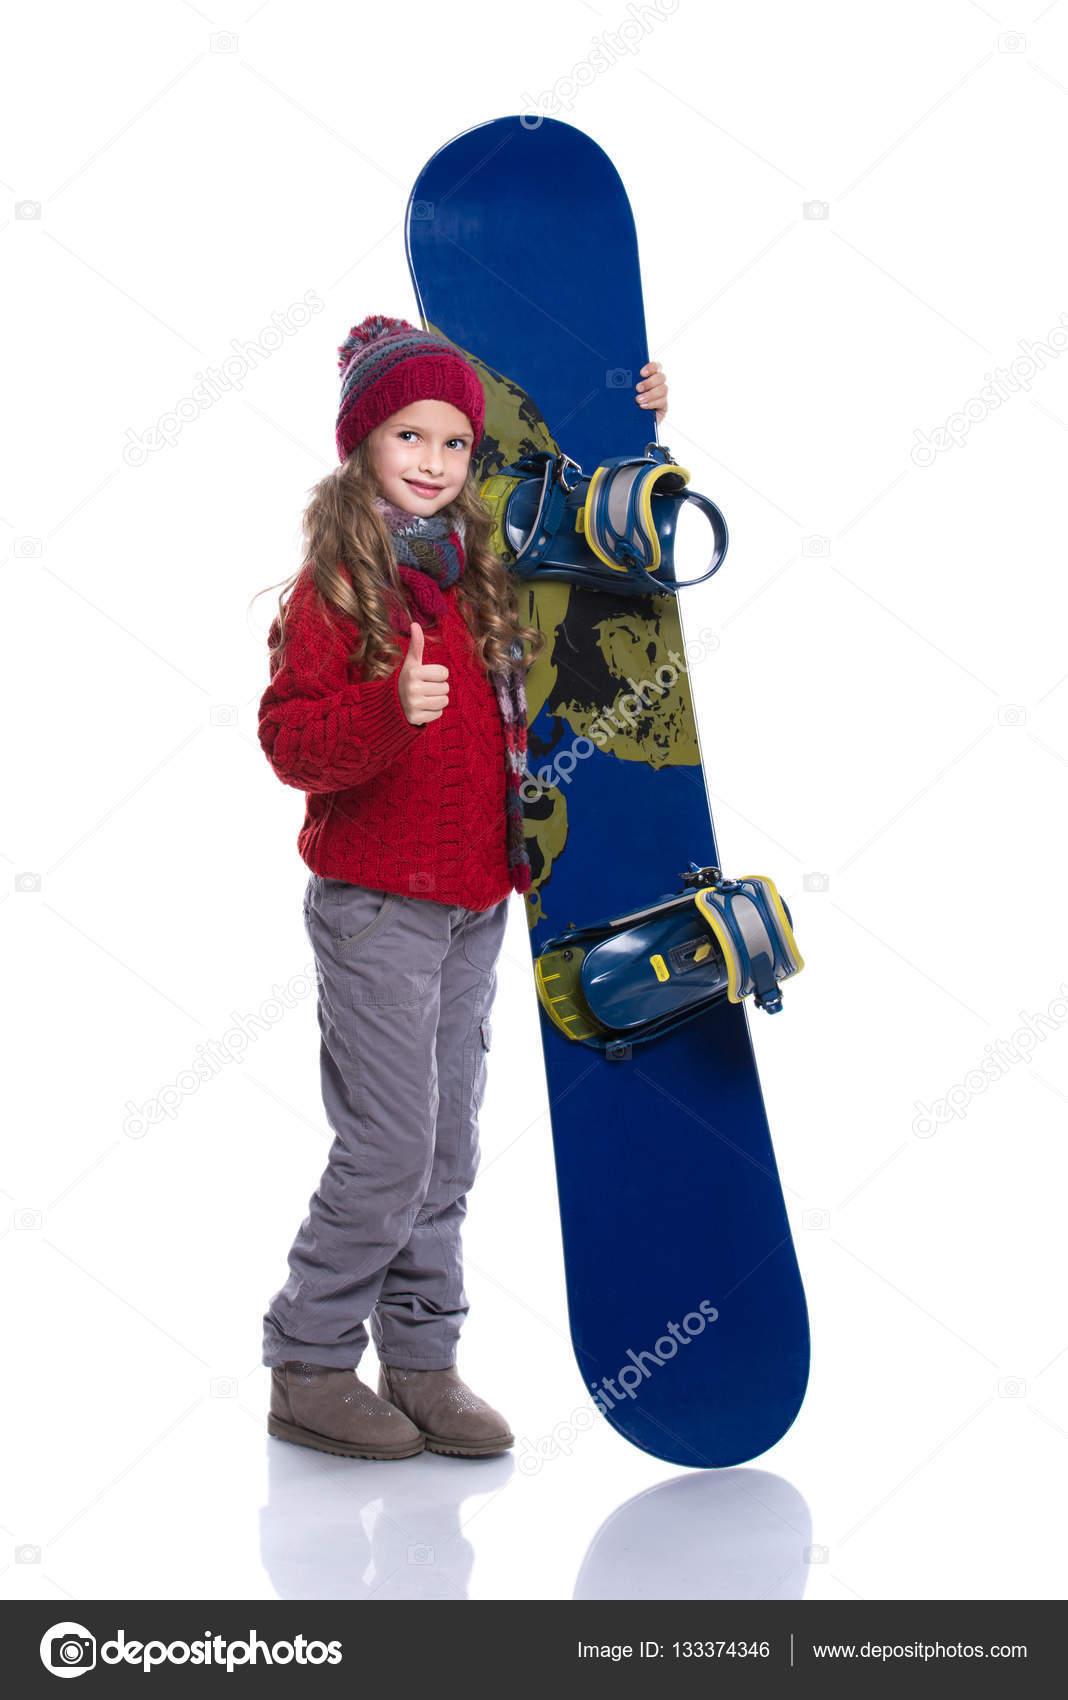 494323ef573 ... hairstyle φορώντας πλεκτά πουλόβερ, κασκόλ, καπέλο και γάντια με μπλε  snowboard, απομονωμένα σε λευκό. Εμφάνιση αντίχειρες. Χειμερινά ρούχα και  αθλητικά ...